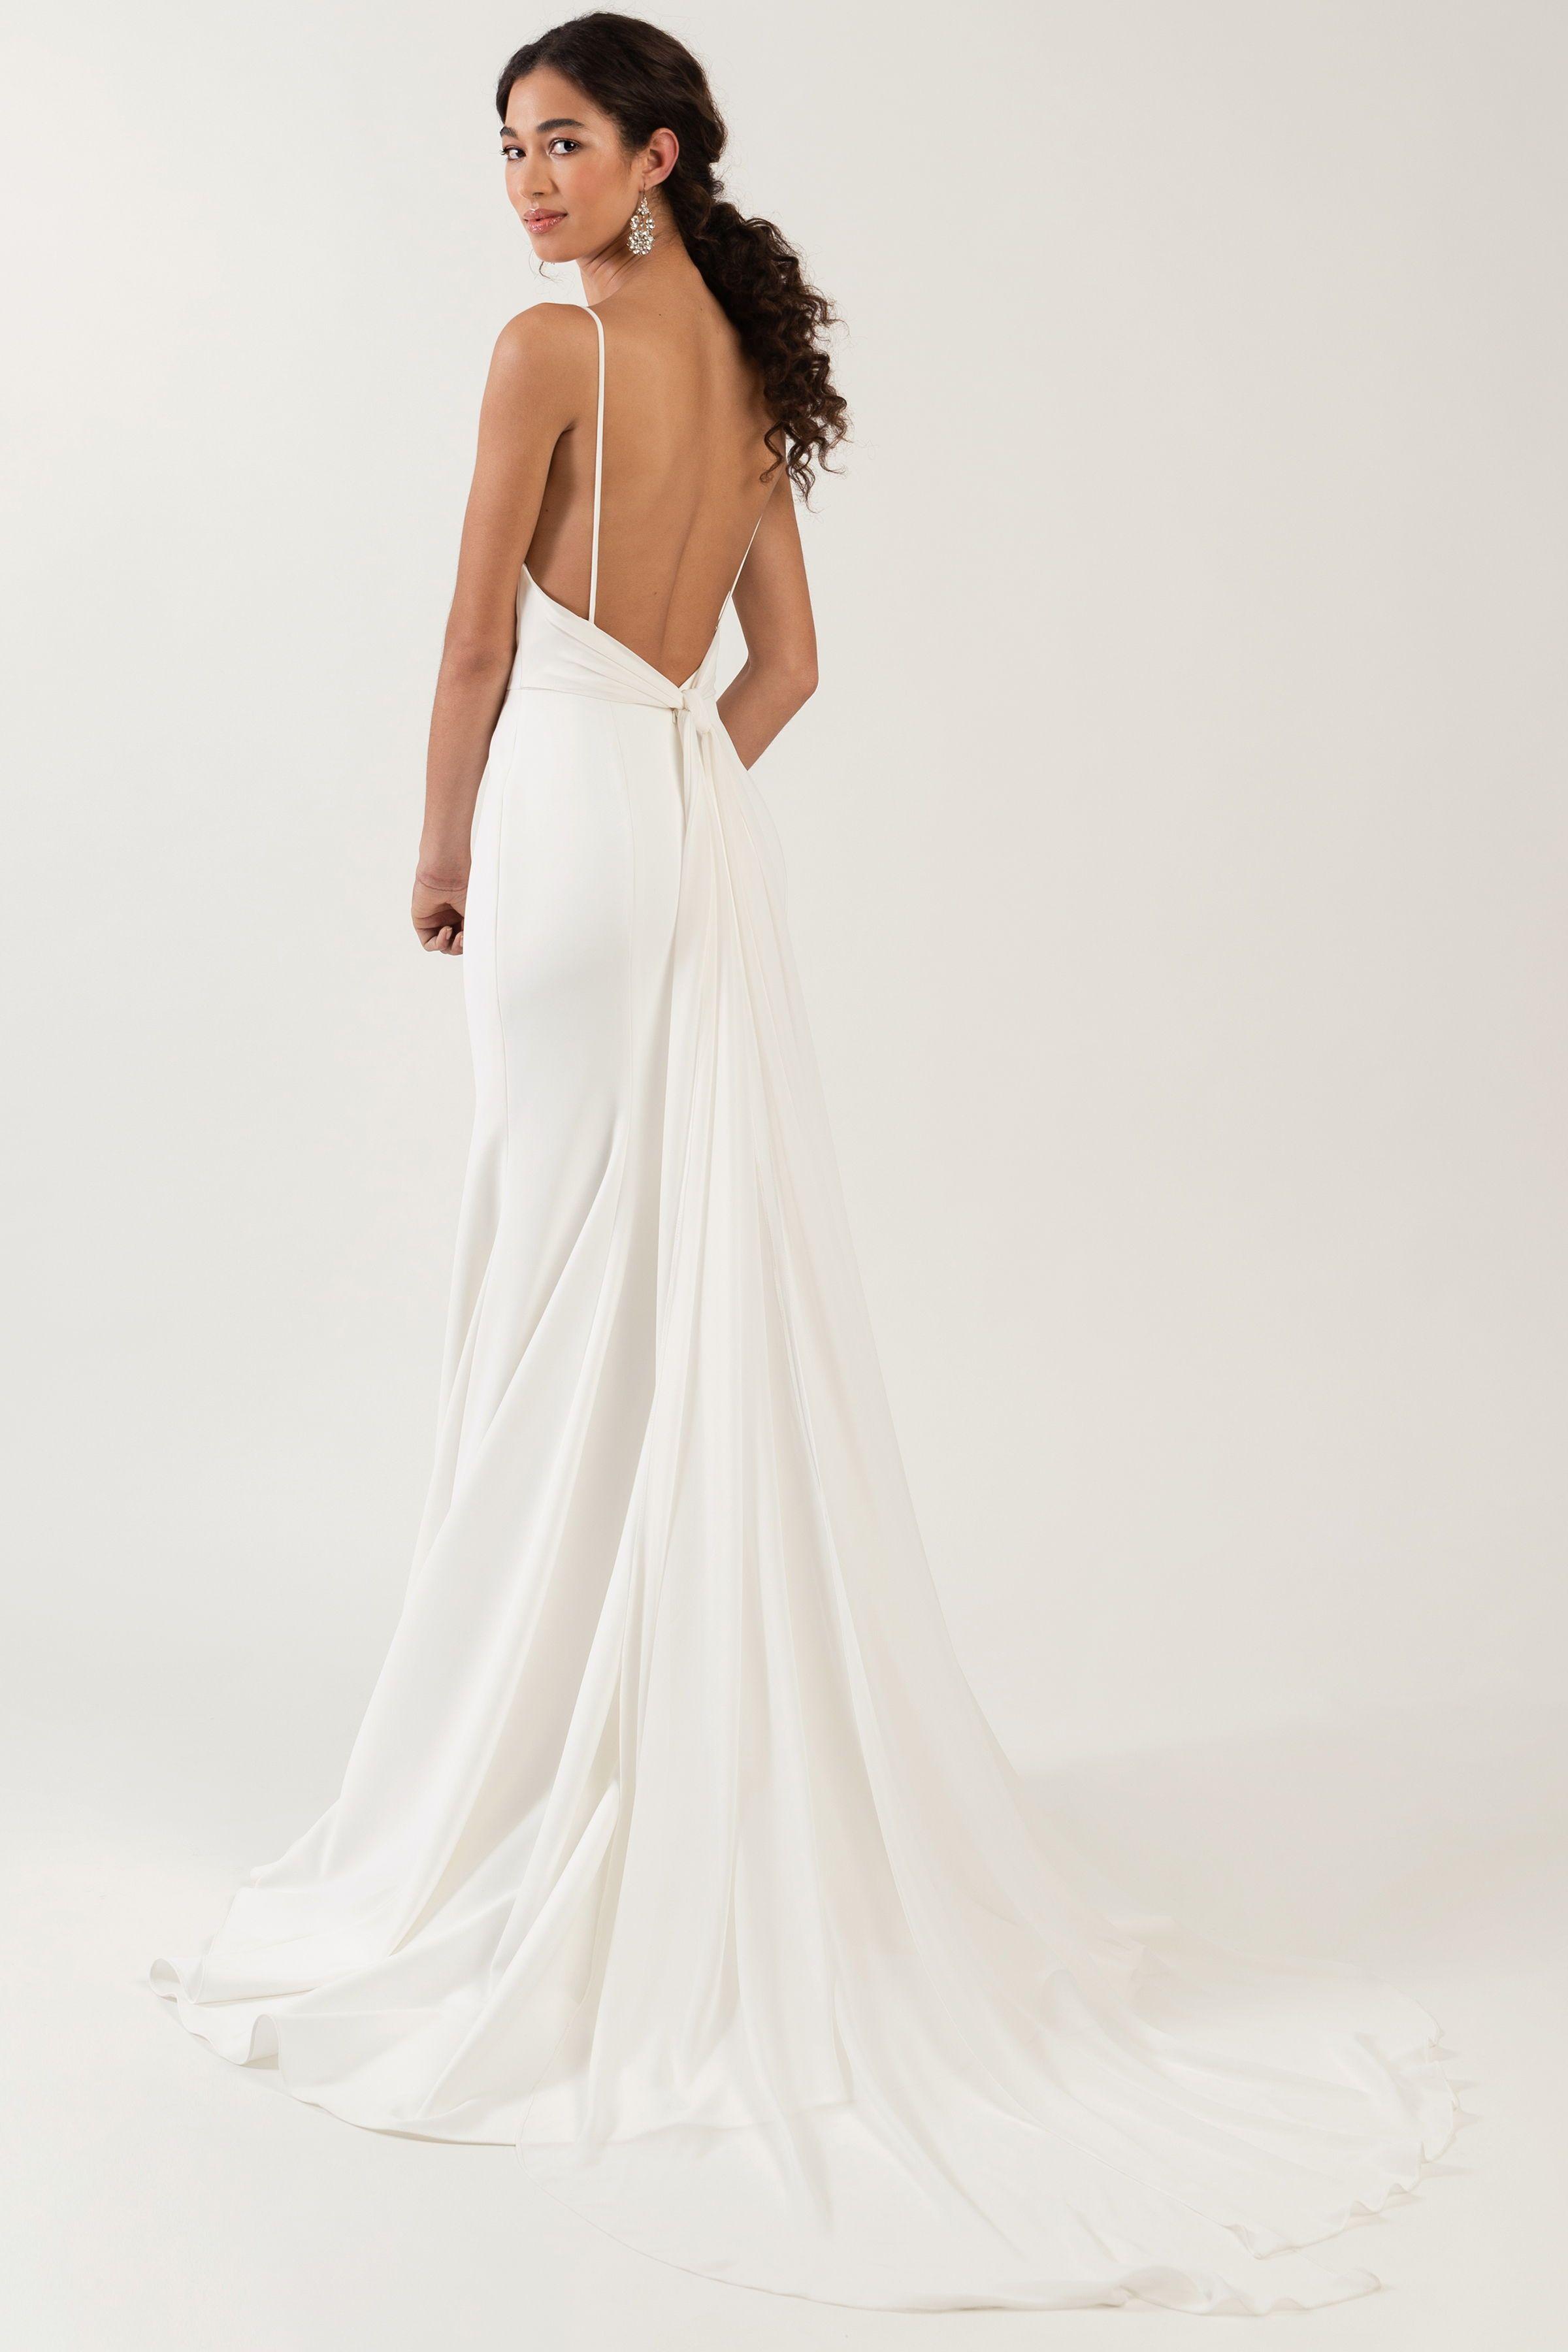 The Top 8 Wedding Dress Shapes And Silhouettes Defined Minimalist Wedding Dresses Elegant Wedding Dress Classic Wedding Dress [ 1233 x 822 Pixel ]